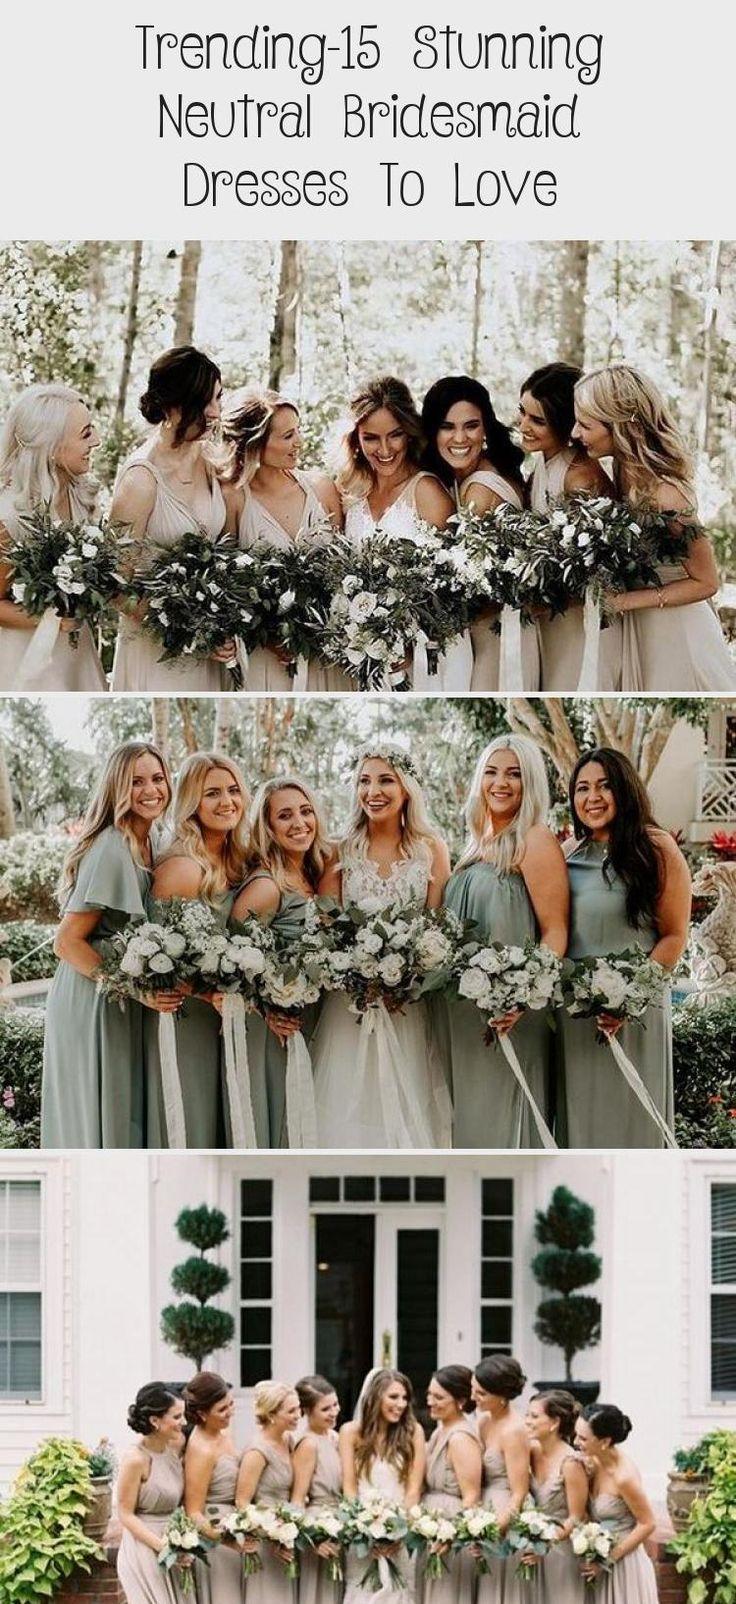 neutral champagne bridesmaid dresses #obde #weddingideas2019 #BridesmaidDressesSummer #DavidsBridalBridesmaidDresses #GreyBridesmaidDresses #BridesmaidDressesFall #BridesmaidDressesWithSleeves